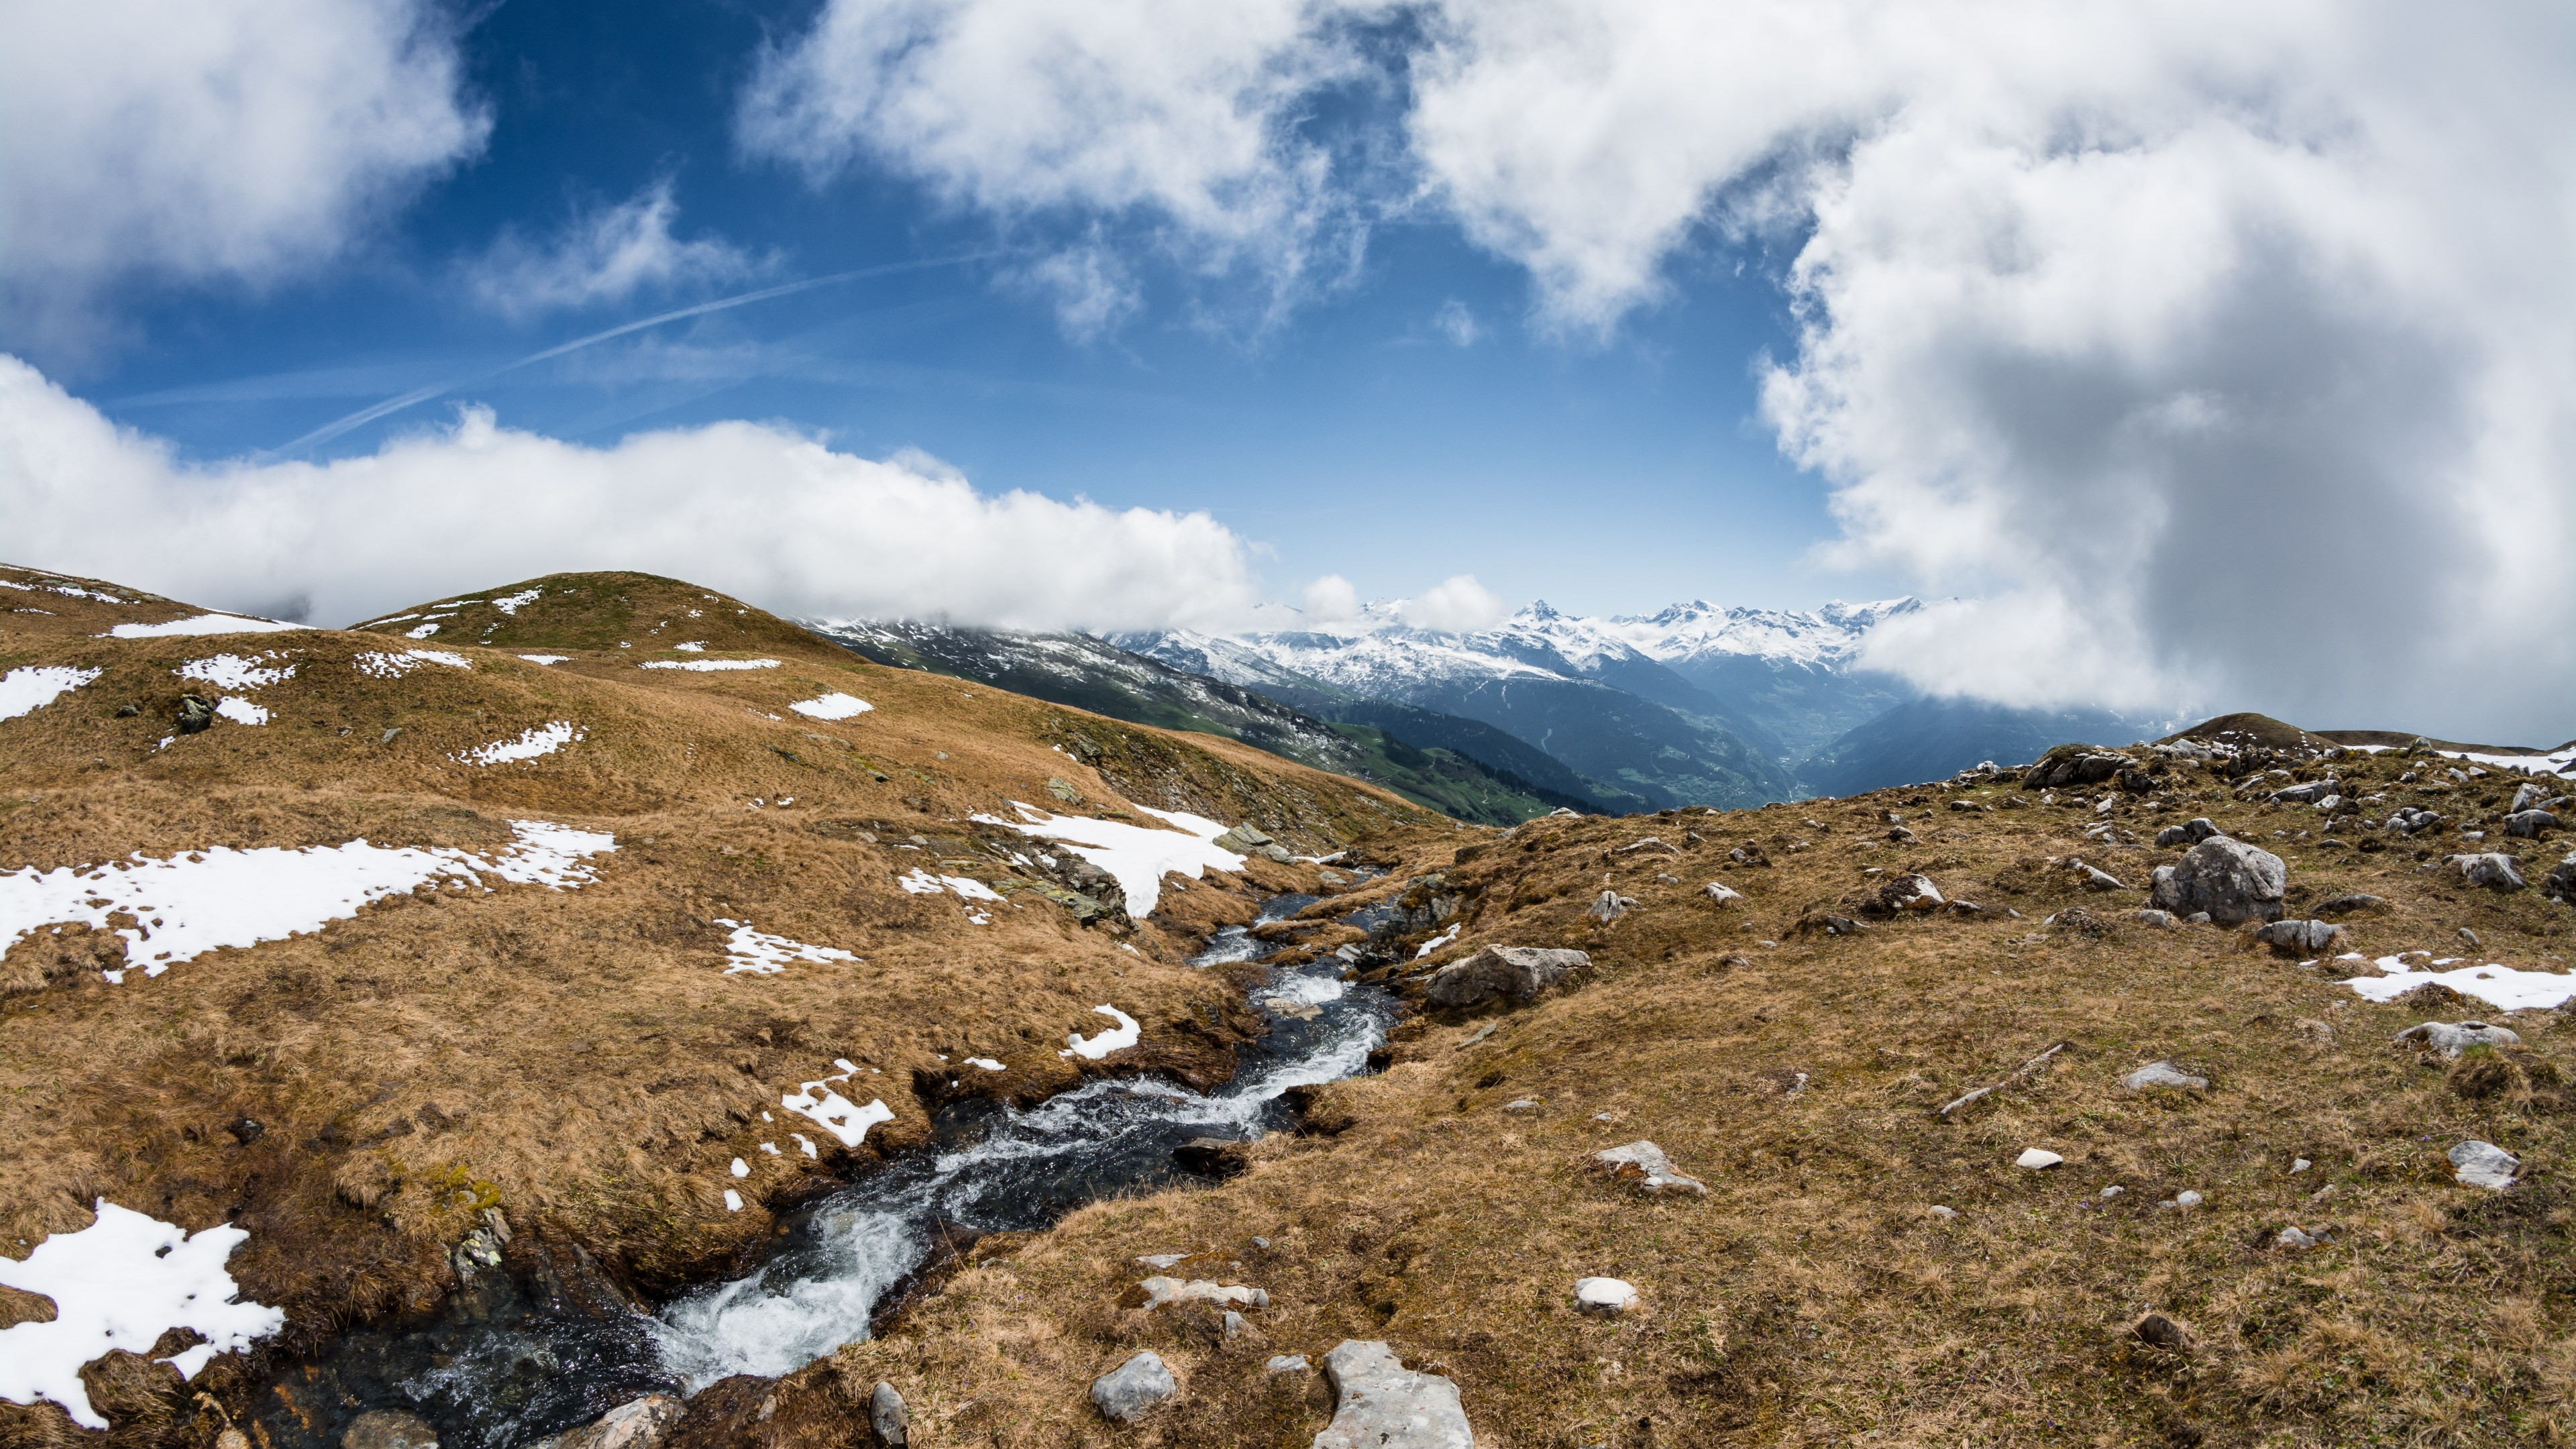 Download Wallpaper Alps Landscape 3840x2160